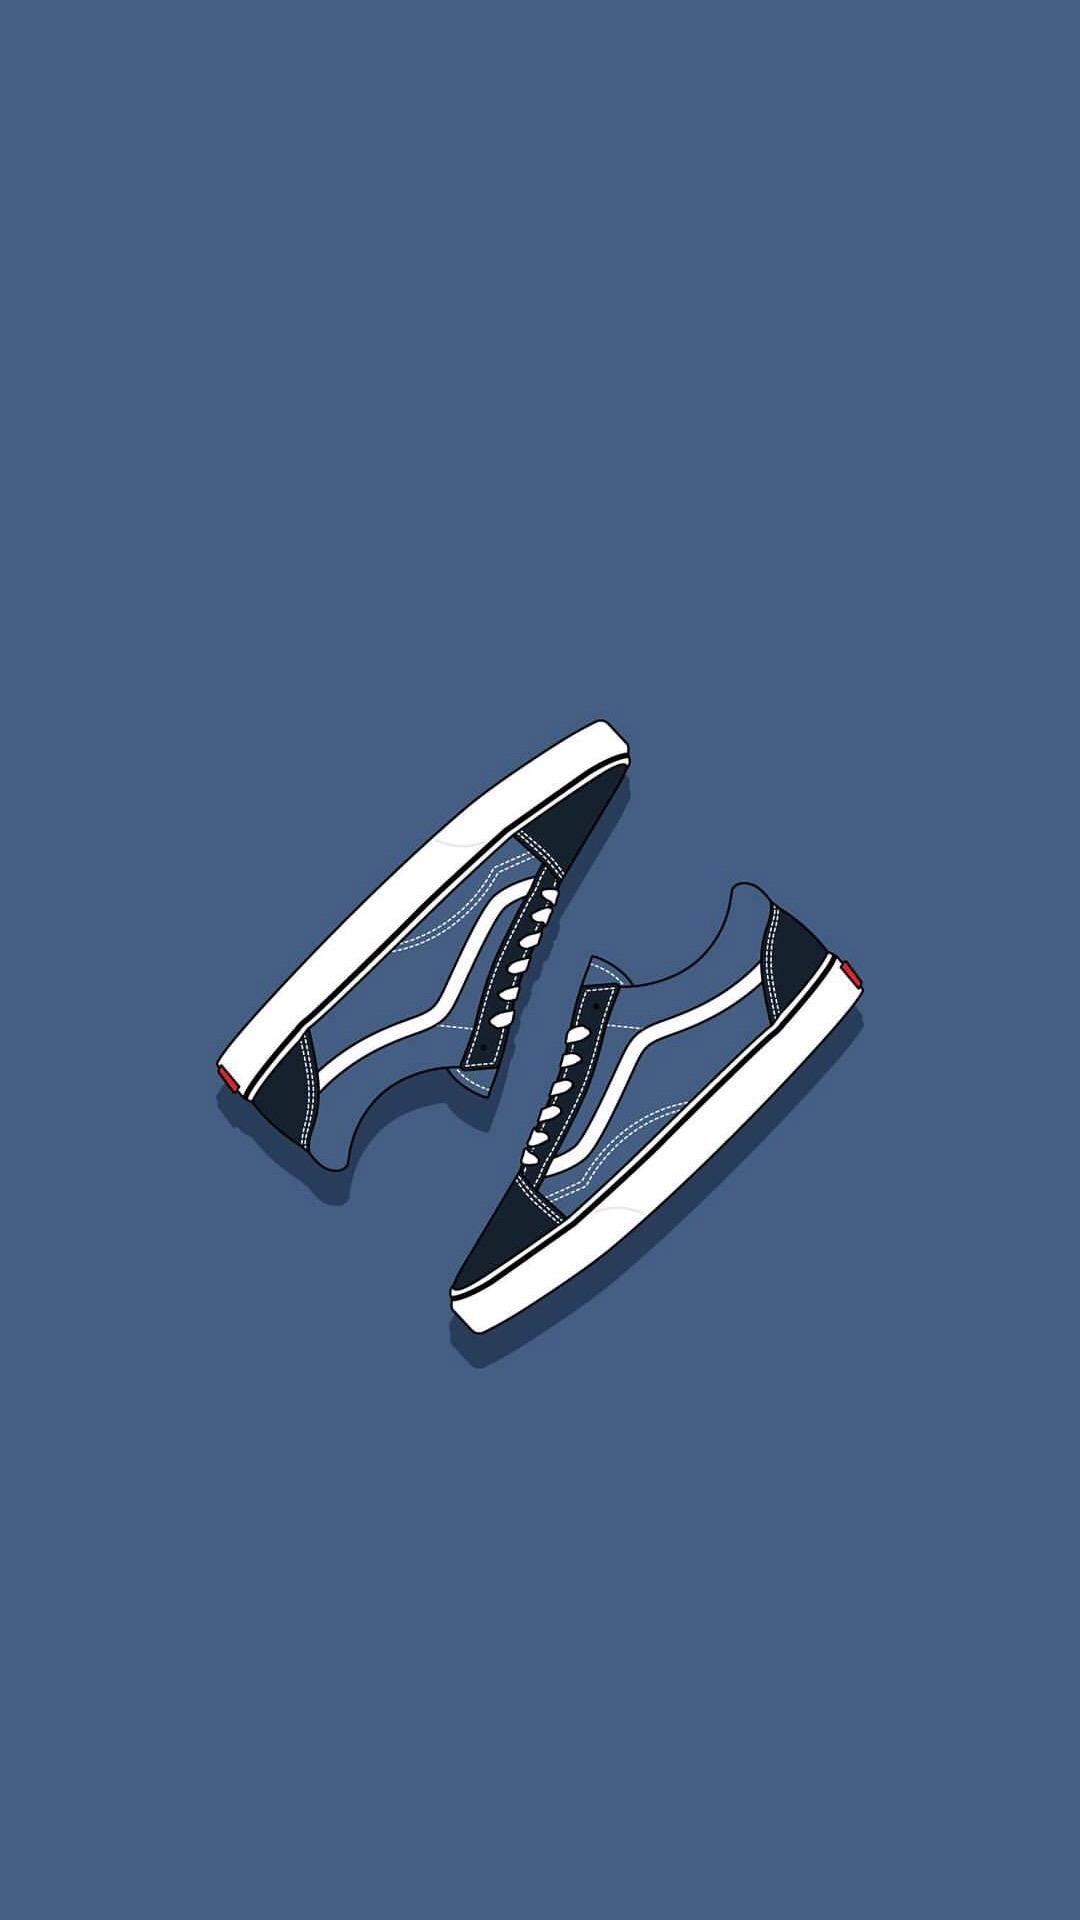 【v粉壁纸】创意手绘板鞋【9p】